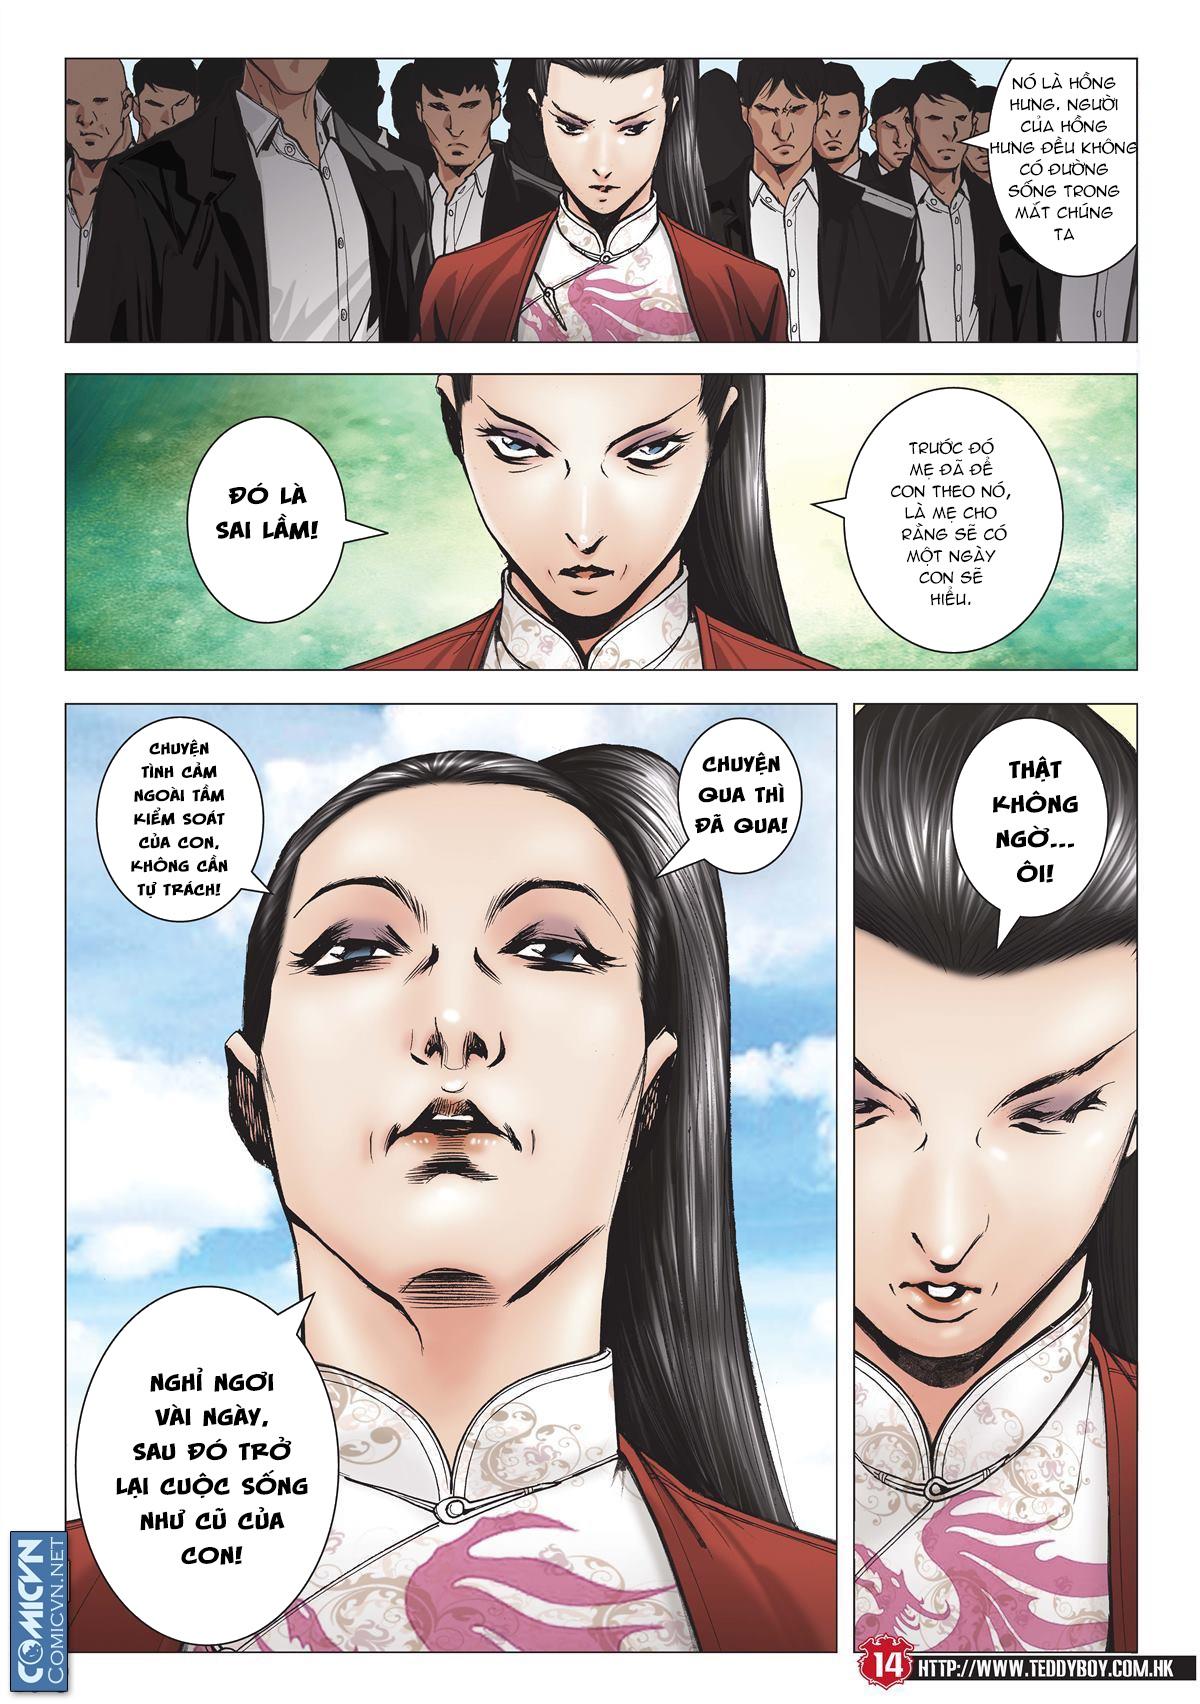 Người Trong Giang Hồ chapter 2001: tự tận trang 13